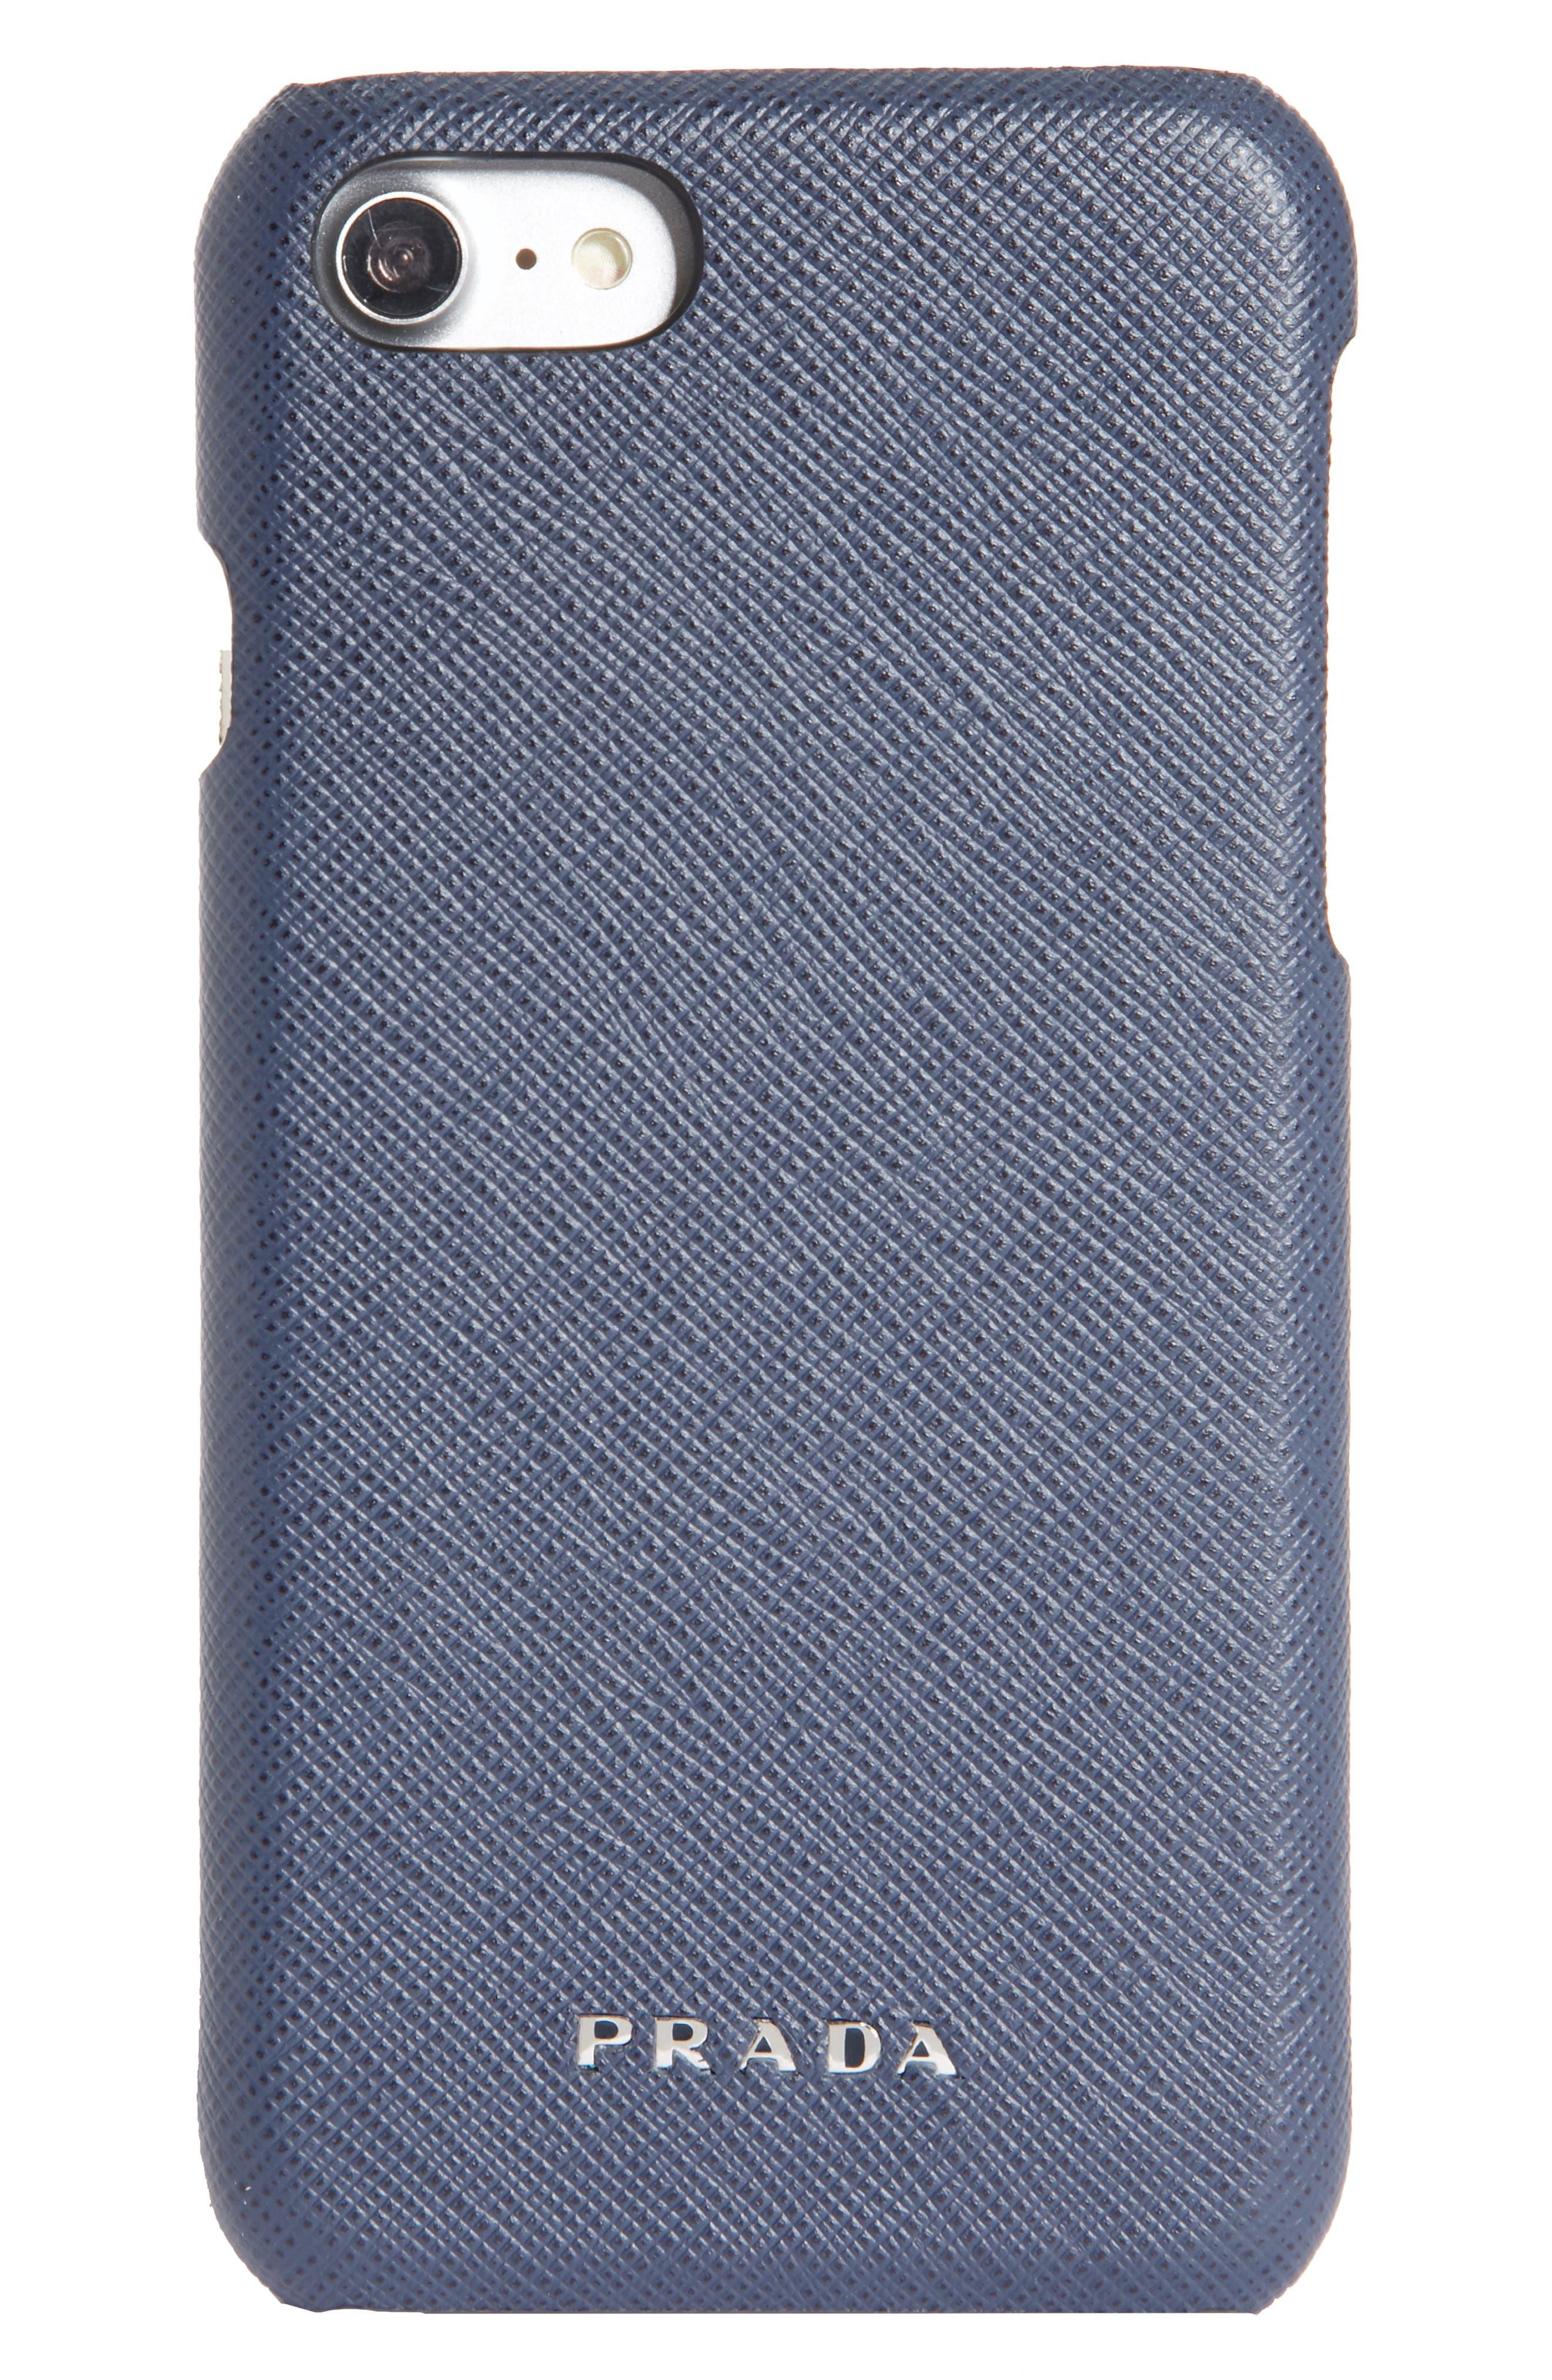 Main Image - Prada Saffiano Leather iPhone 6/6s/7/8 Case